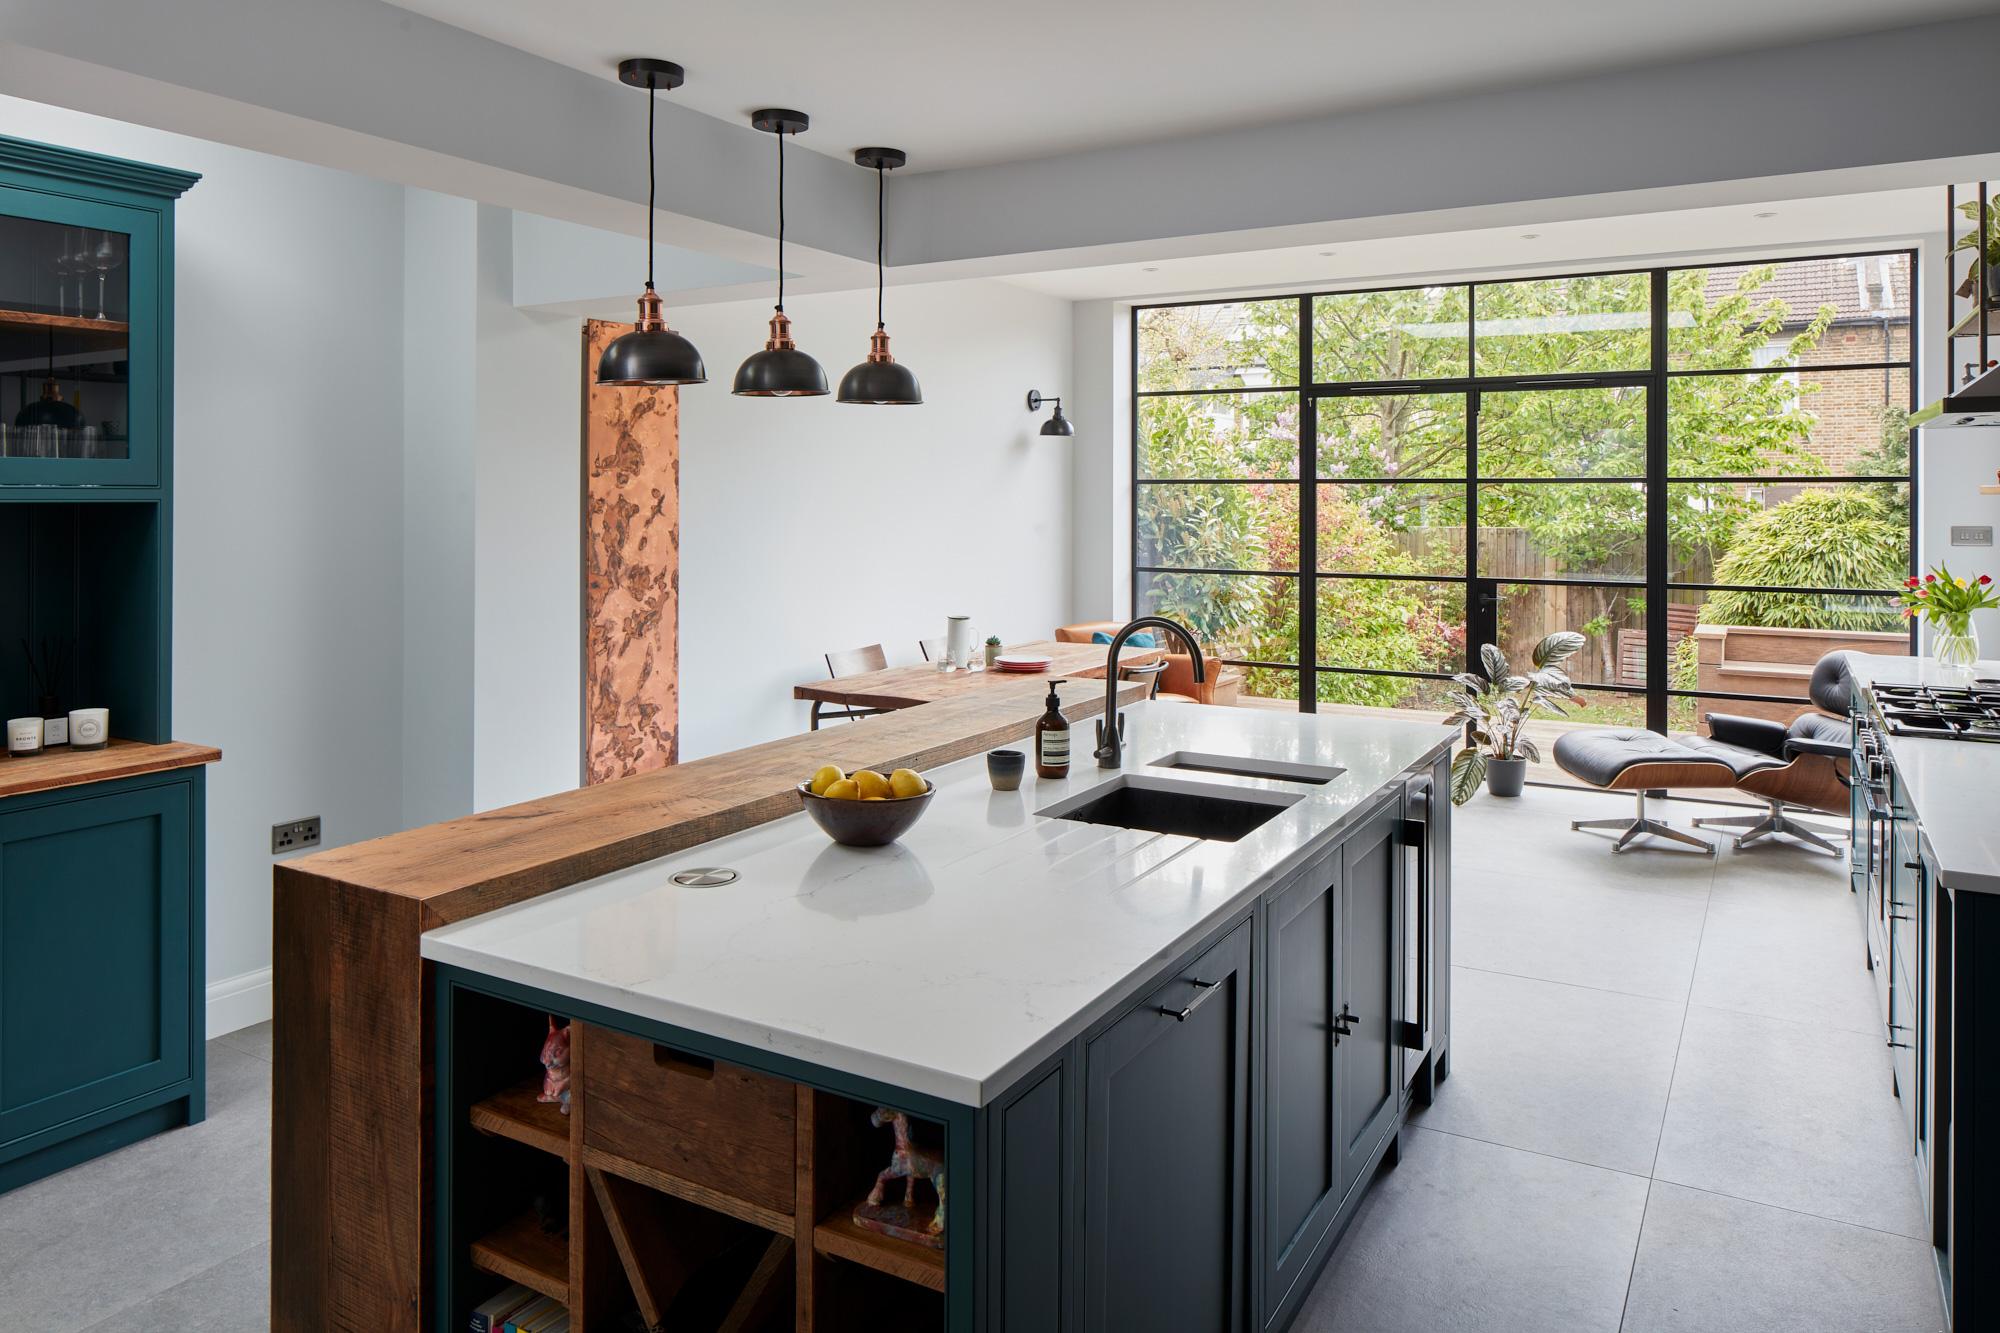 Large Industrial kitchen island